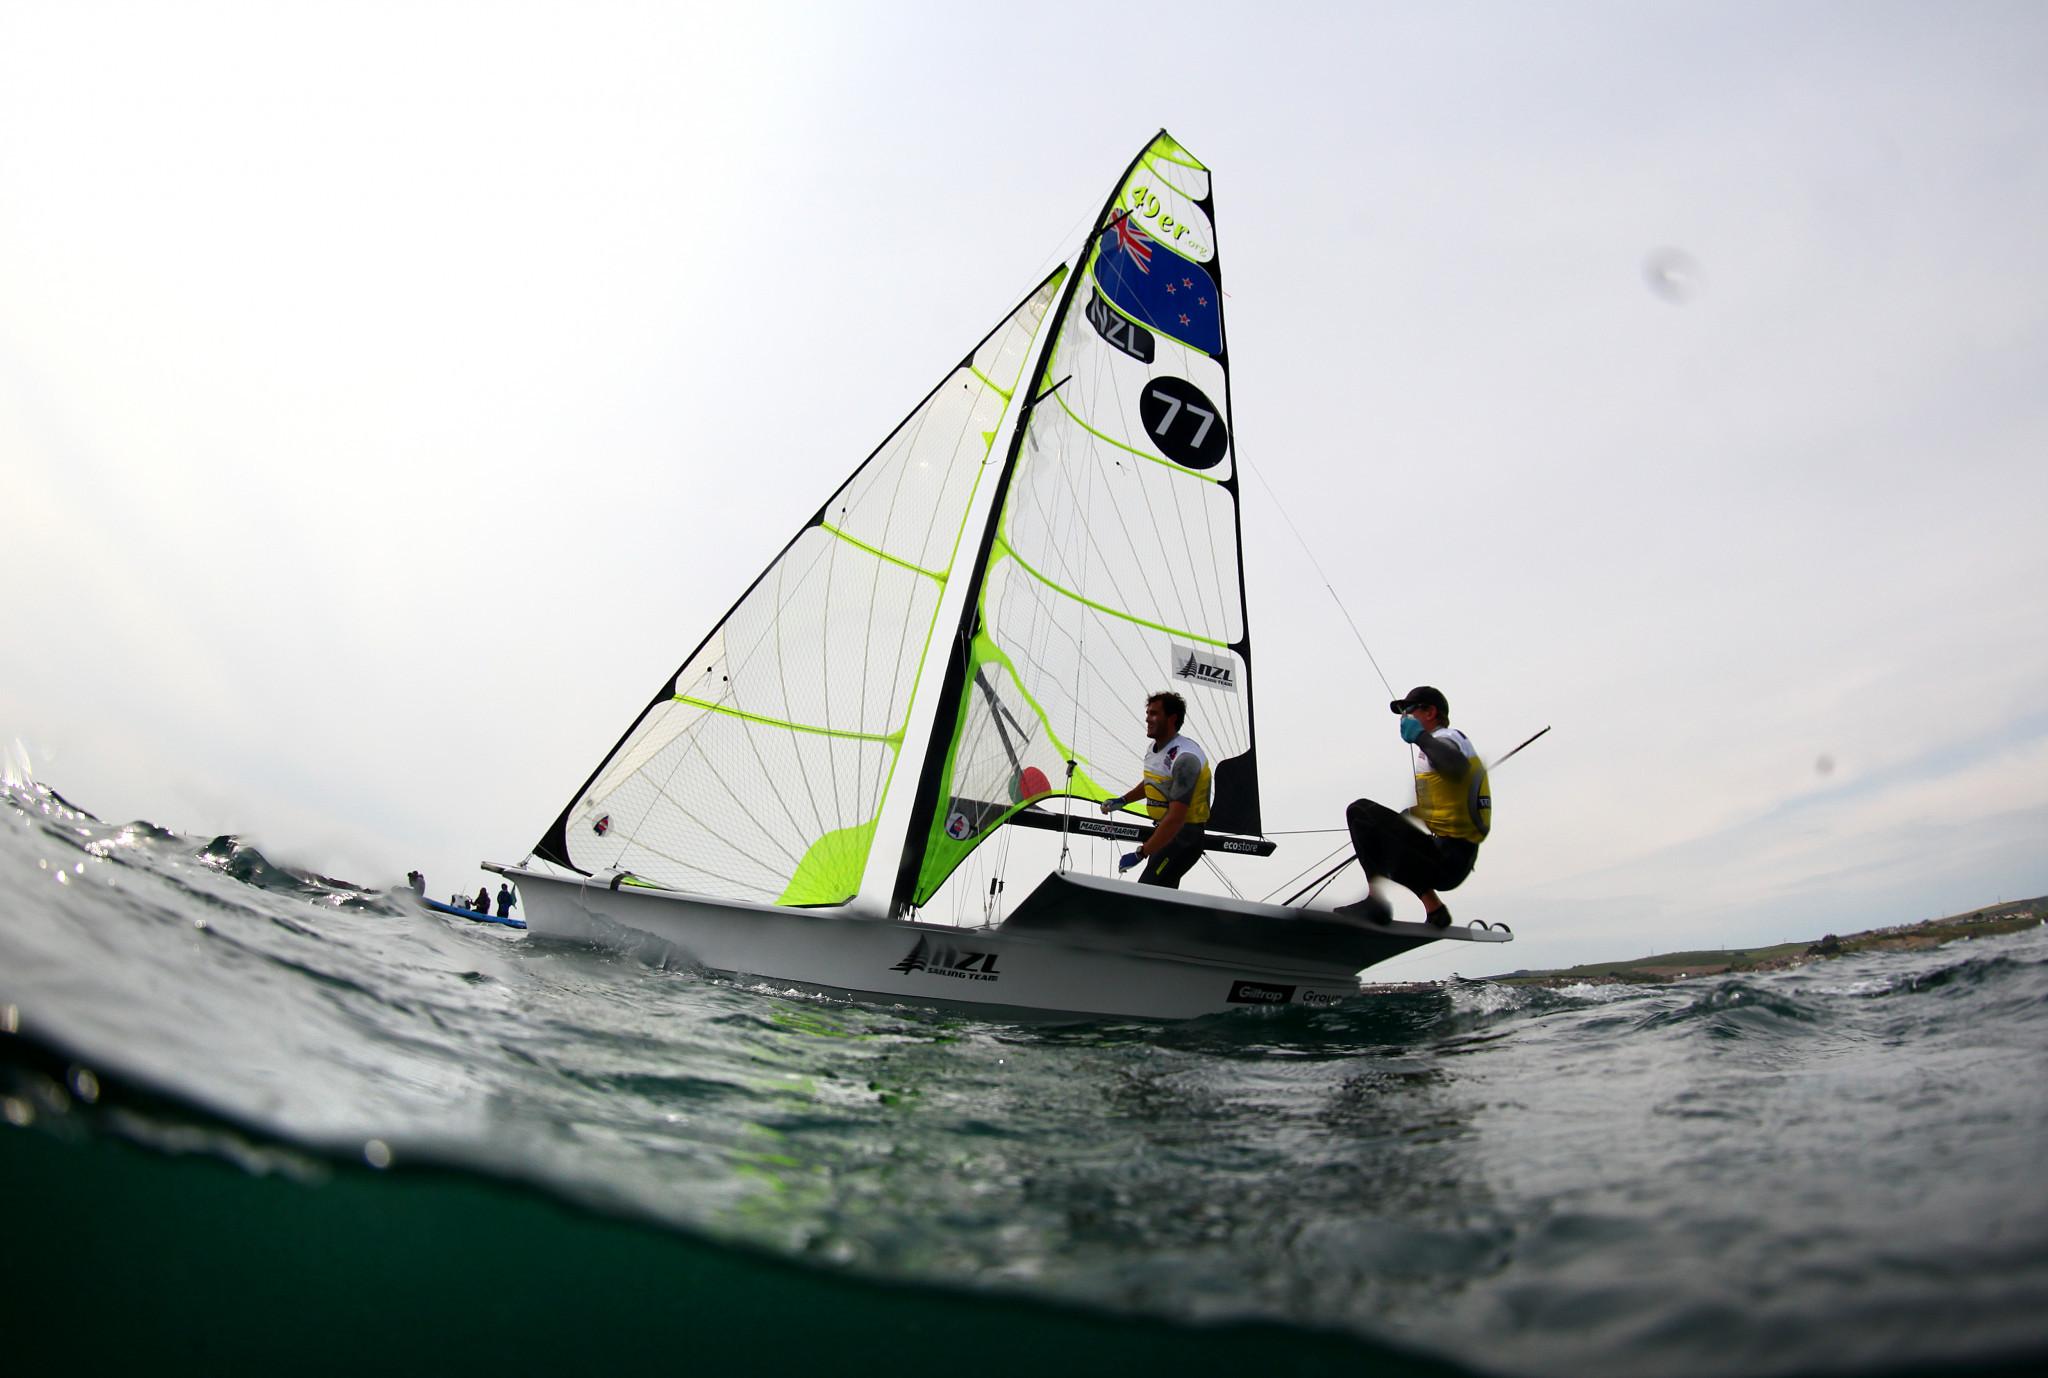 Sailors seek Tokyo 2020 places at 49er, 49erFX and Nacra 17 World Championships